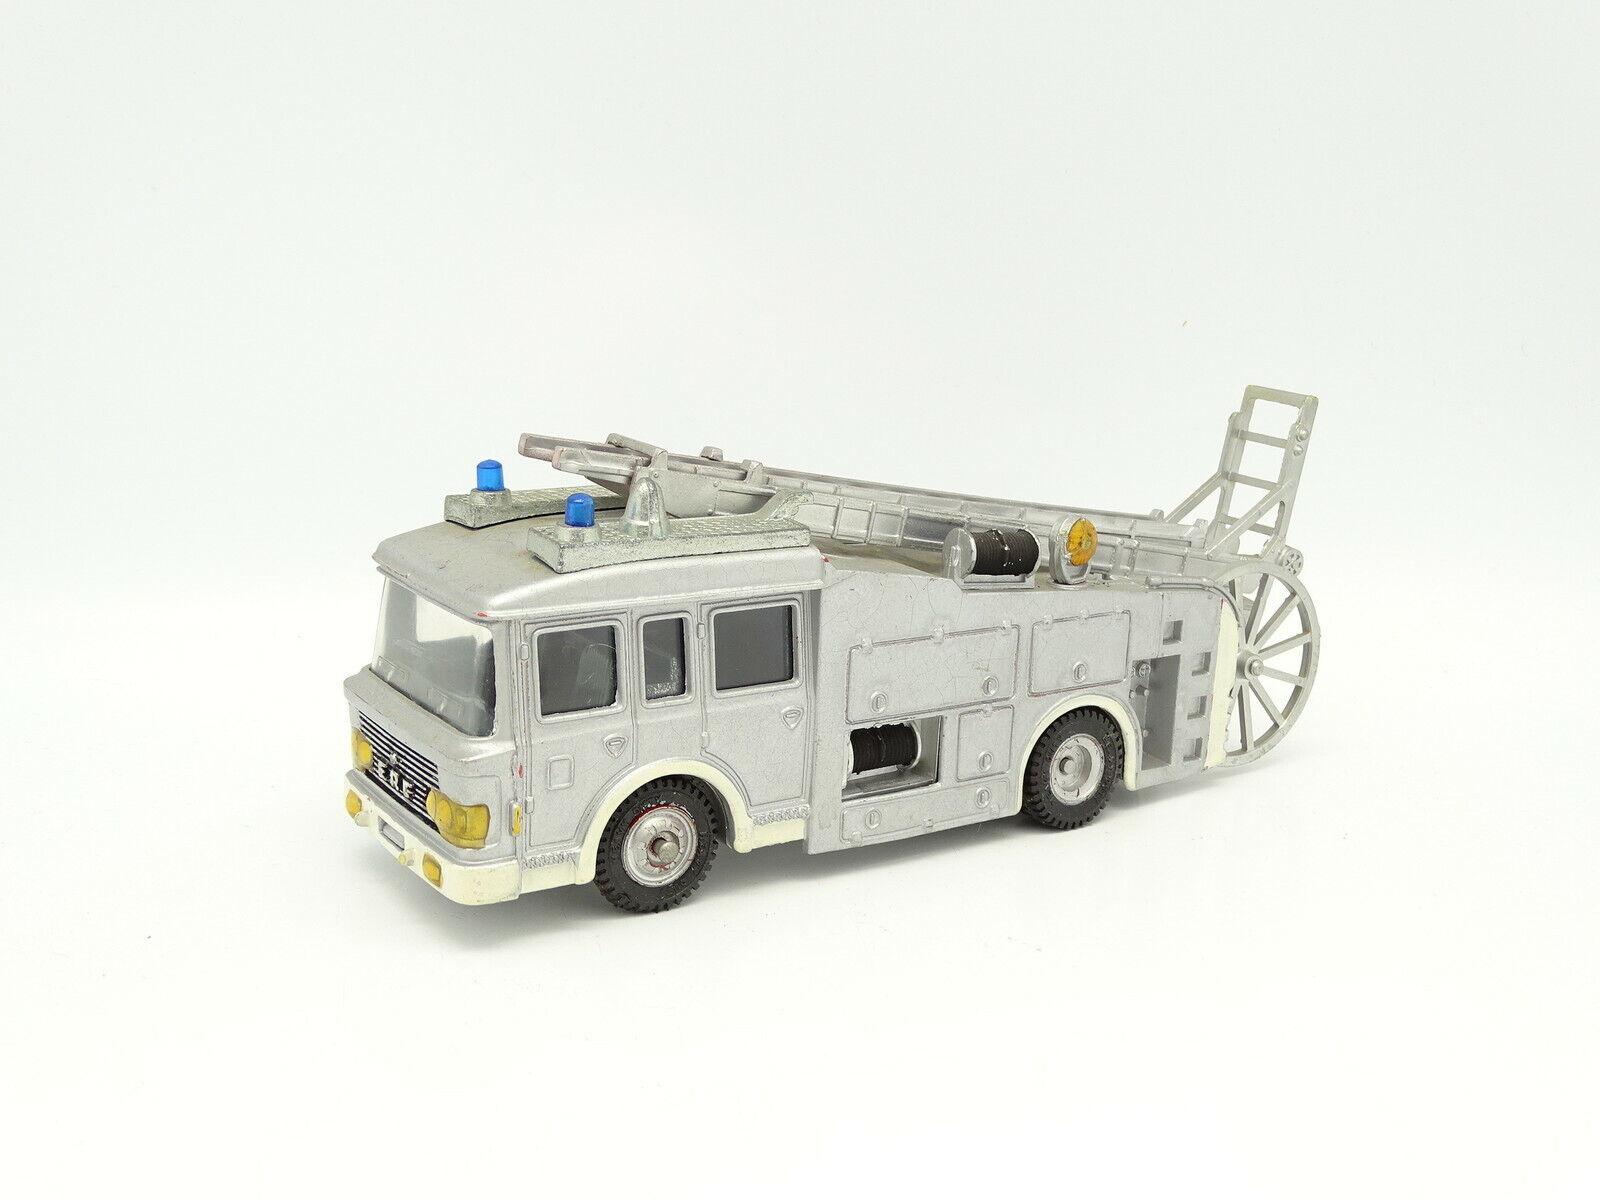 online barato Dinky Juguetes Juguetes Juguetes GB 1 43 - ERF Fire Tender 266 Bomberos gris  venta caliente